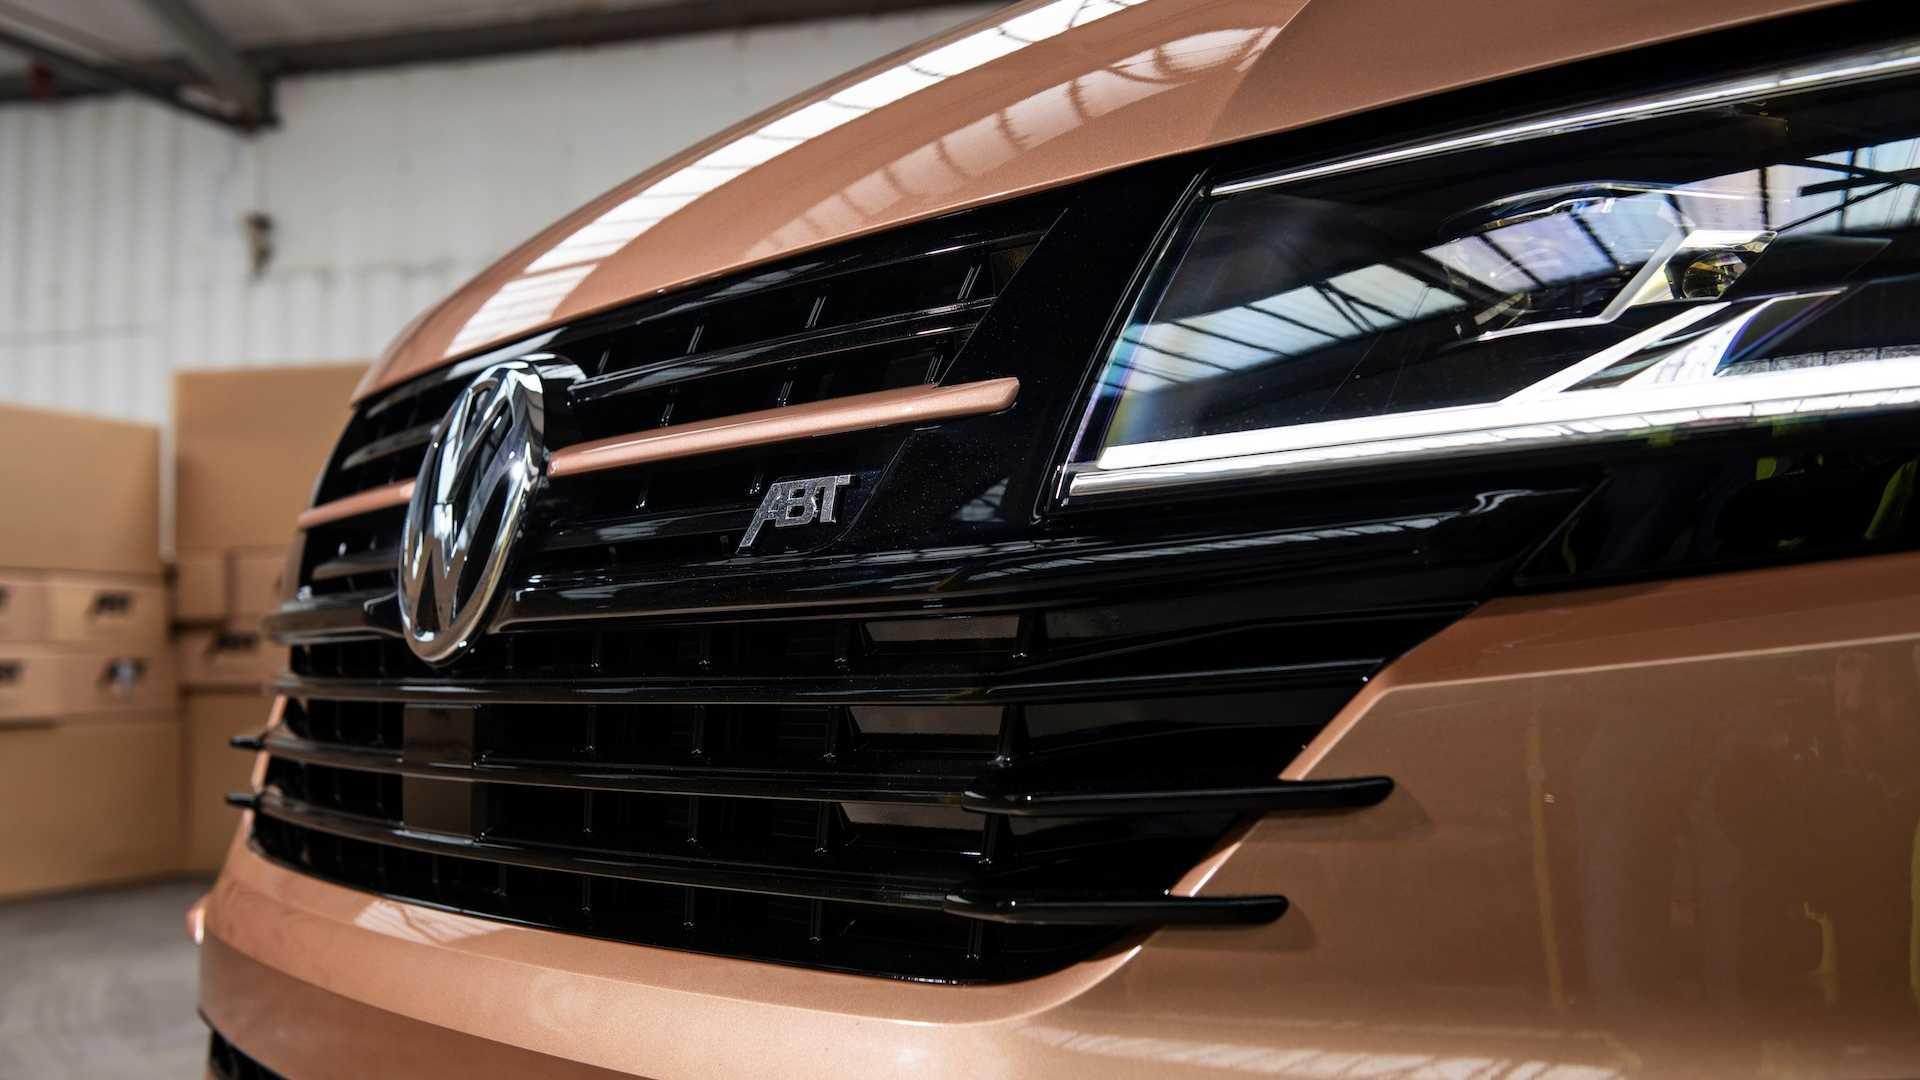 VW-Transporter-by-ABT-9